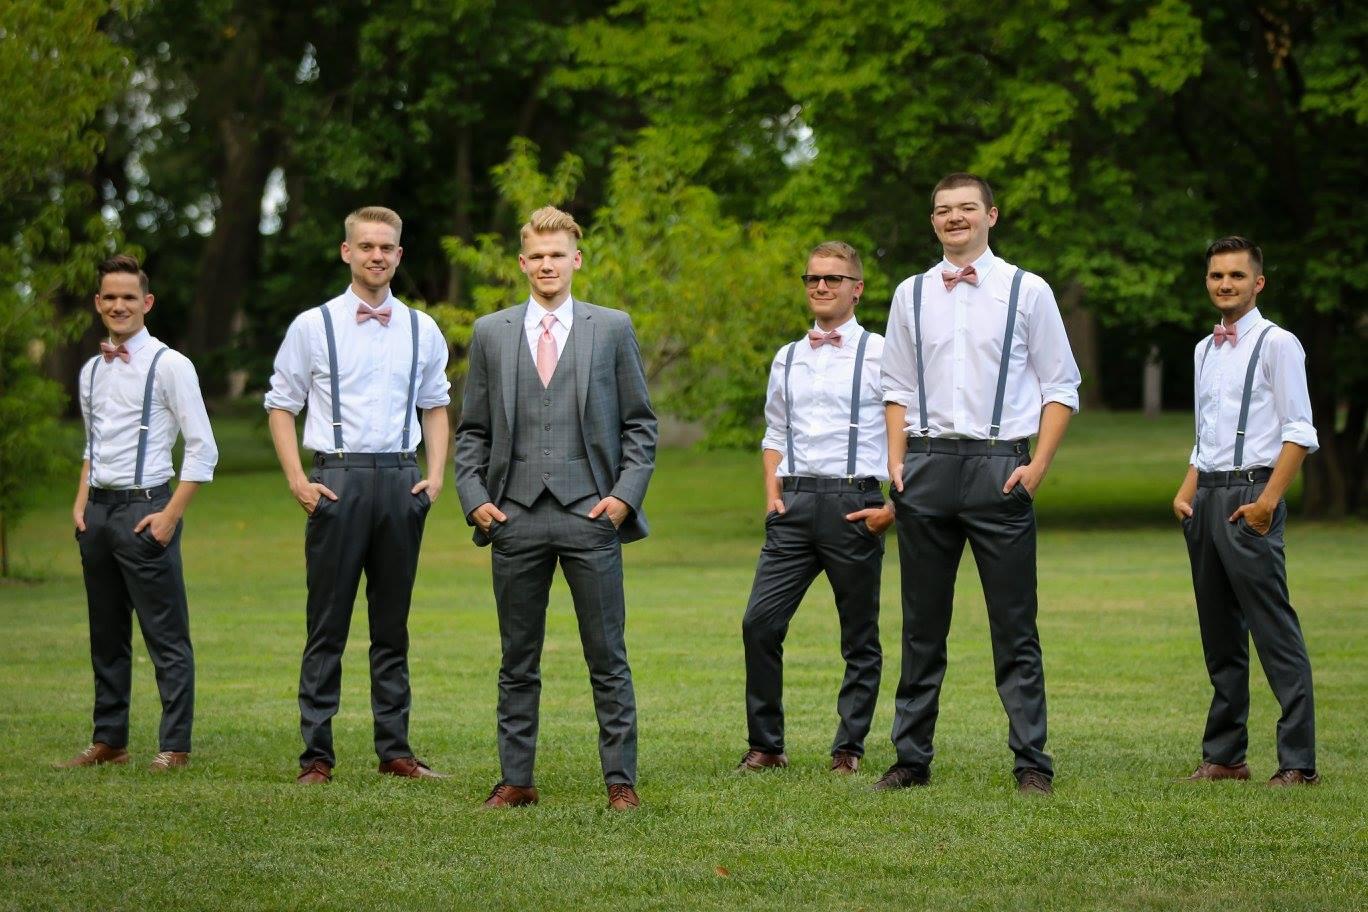 Men's Tux